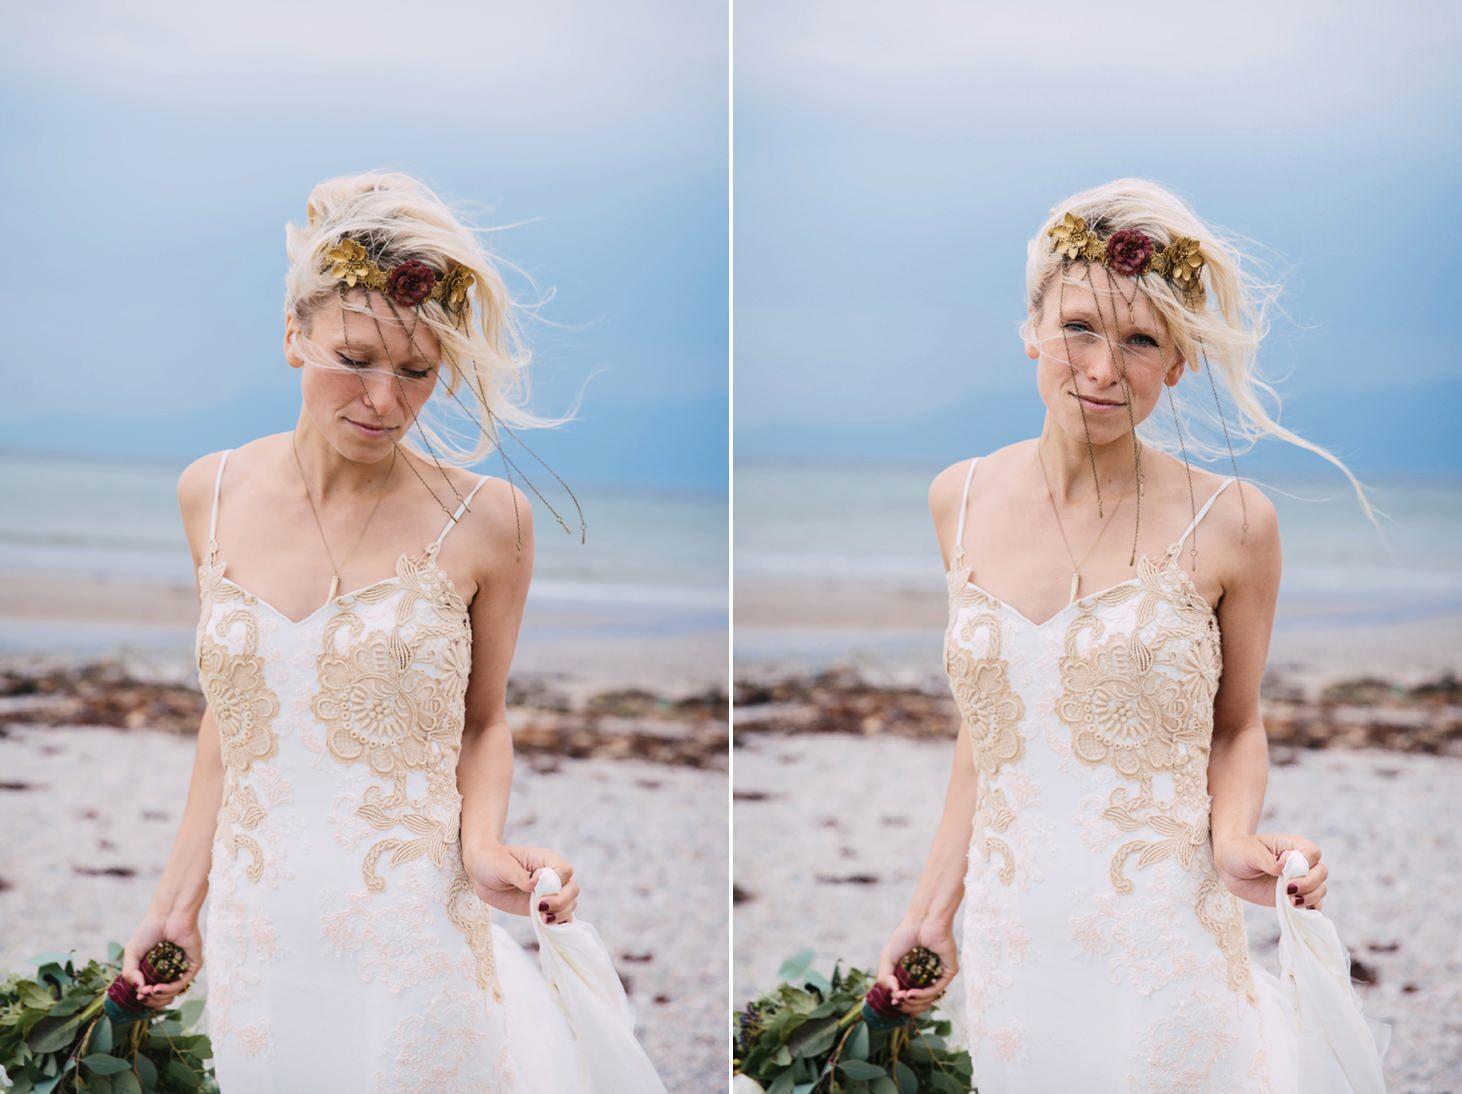 sle of bute wedding photography portrait of bride